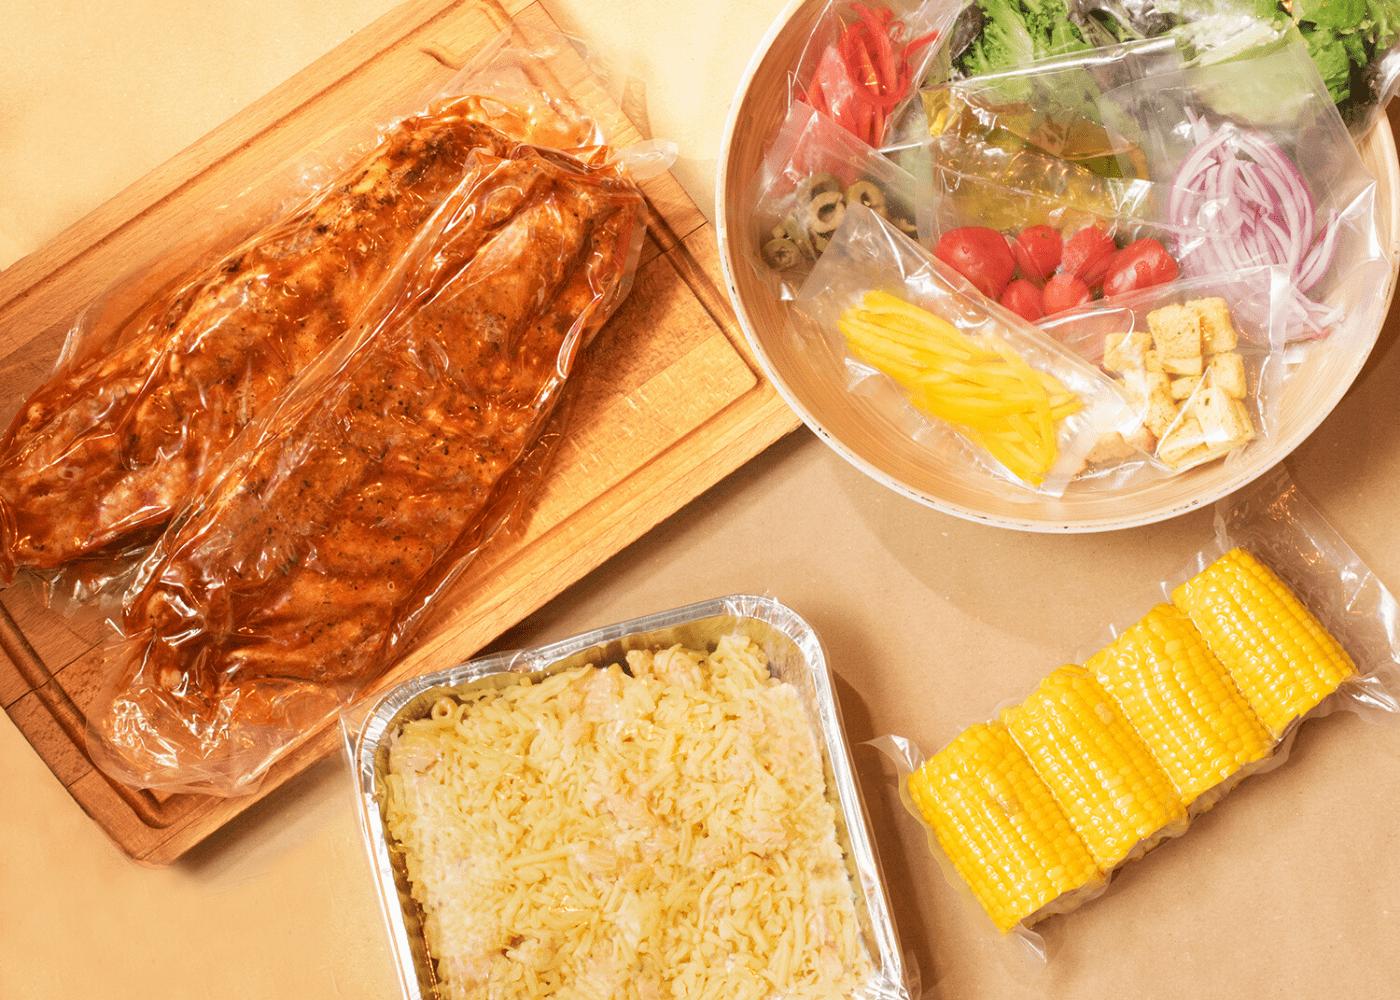 DIY meal kits: Morganfield's